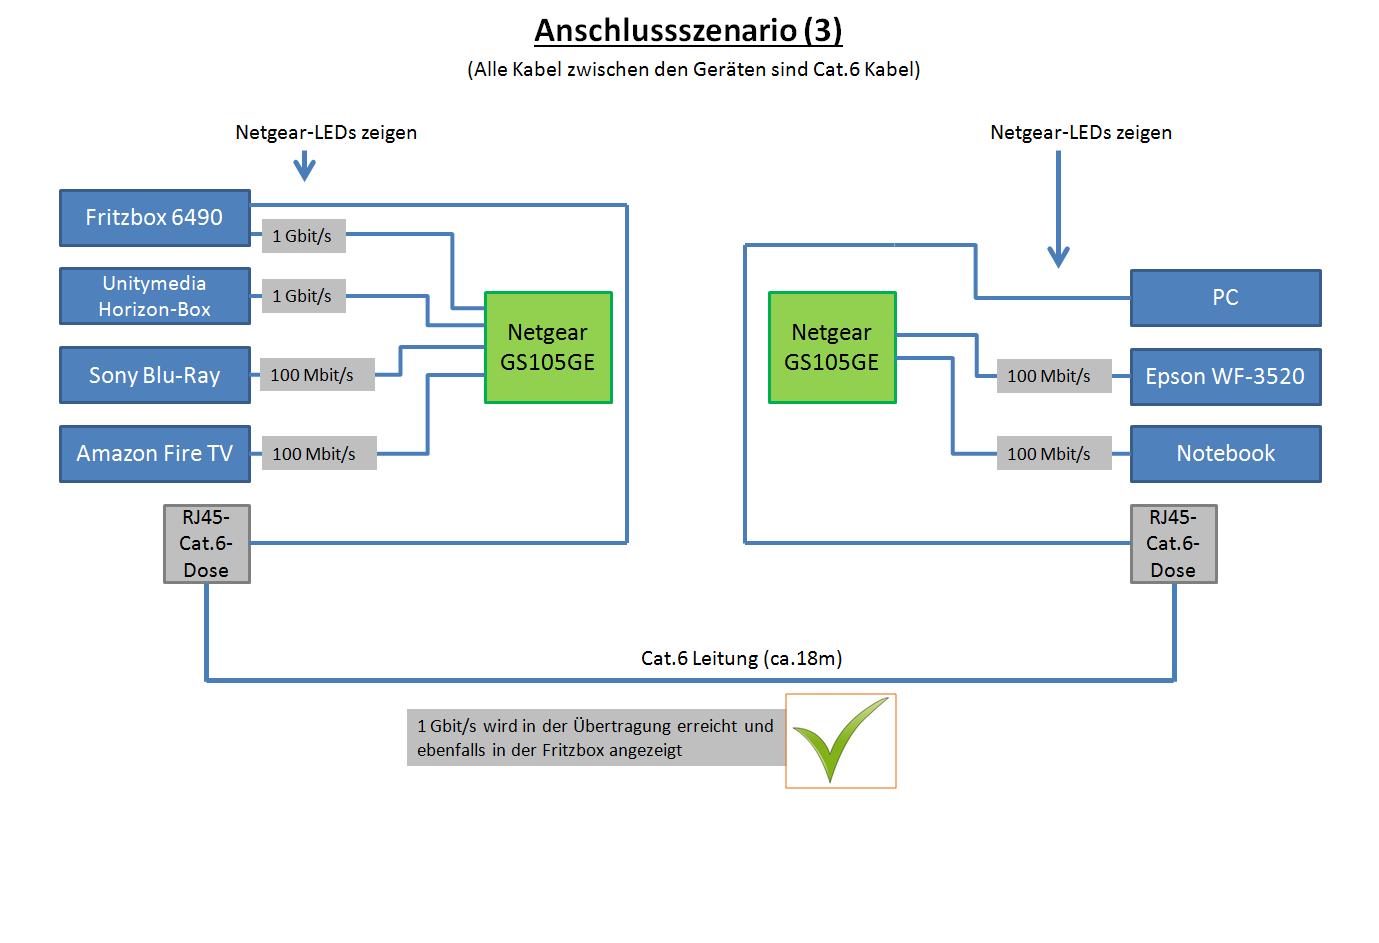 Atemberaubend Ethernet Cat6 Crossover Kabel Schaltplan Ideen - Die ...